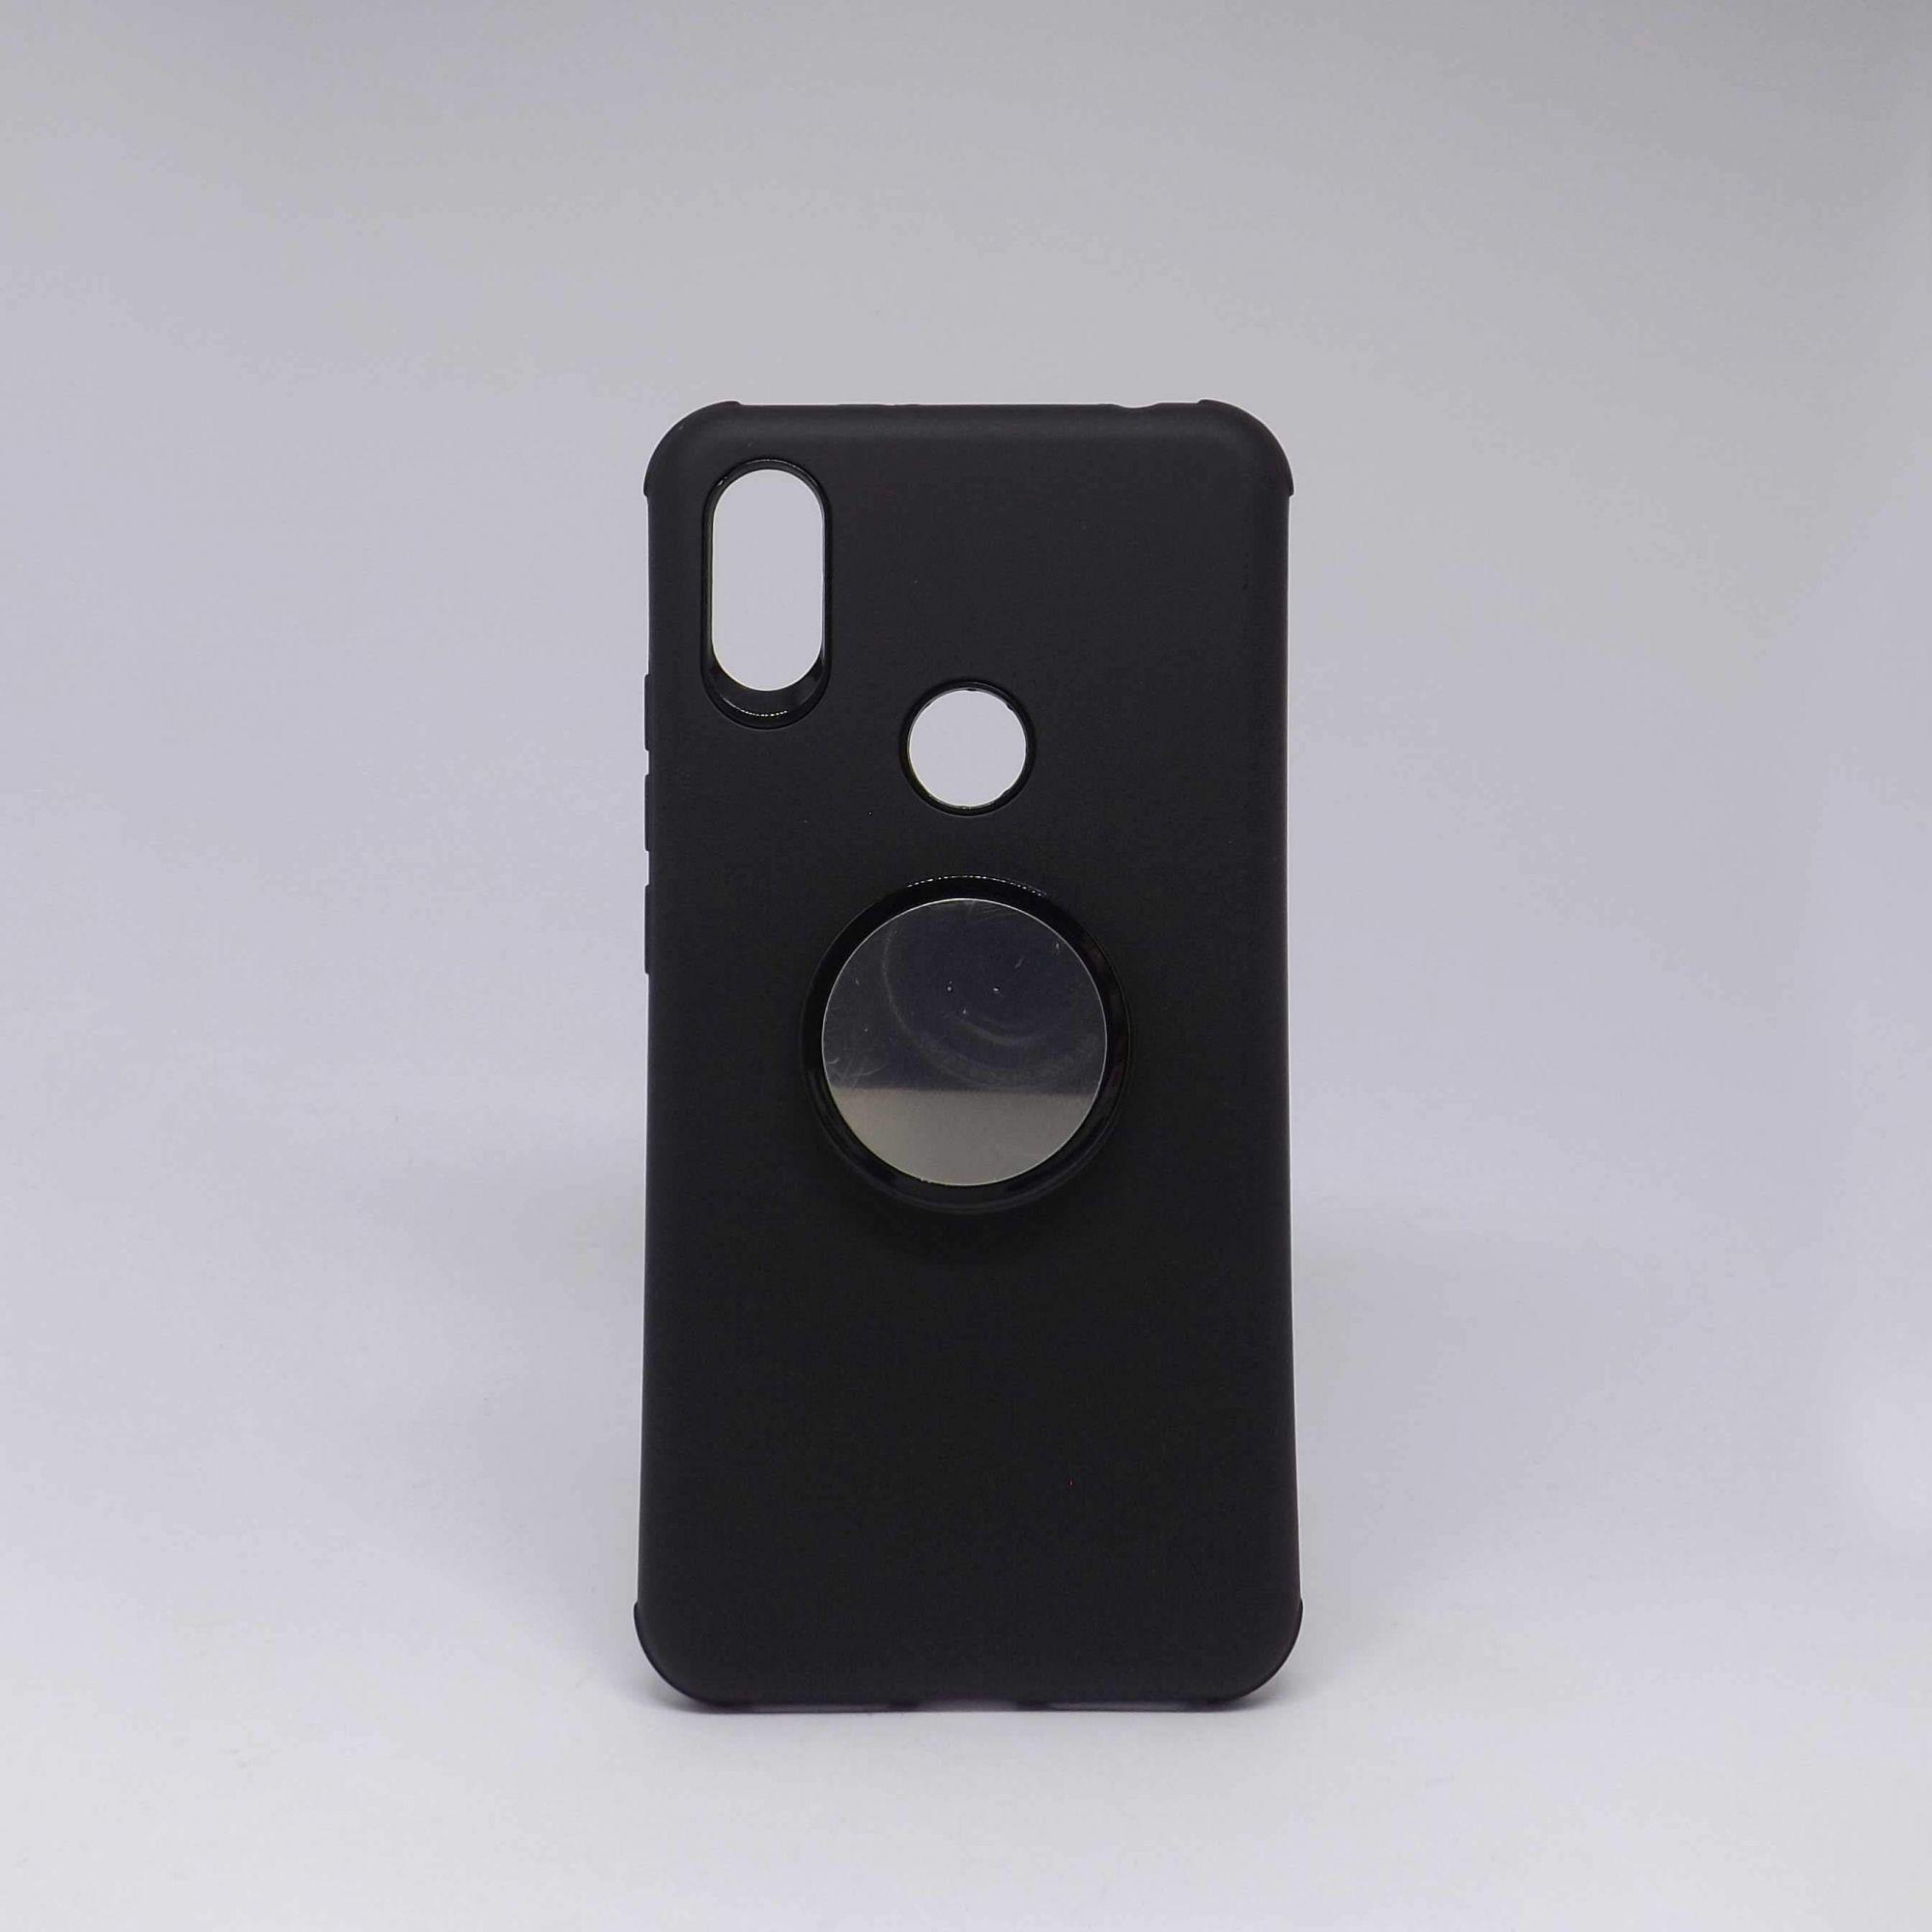 Capa Xiaomi Redmi S2 Antiqueda com Pop Case